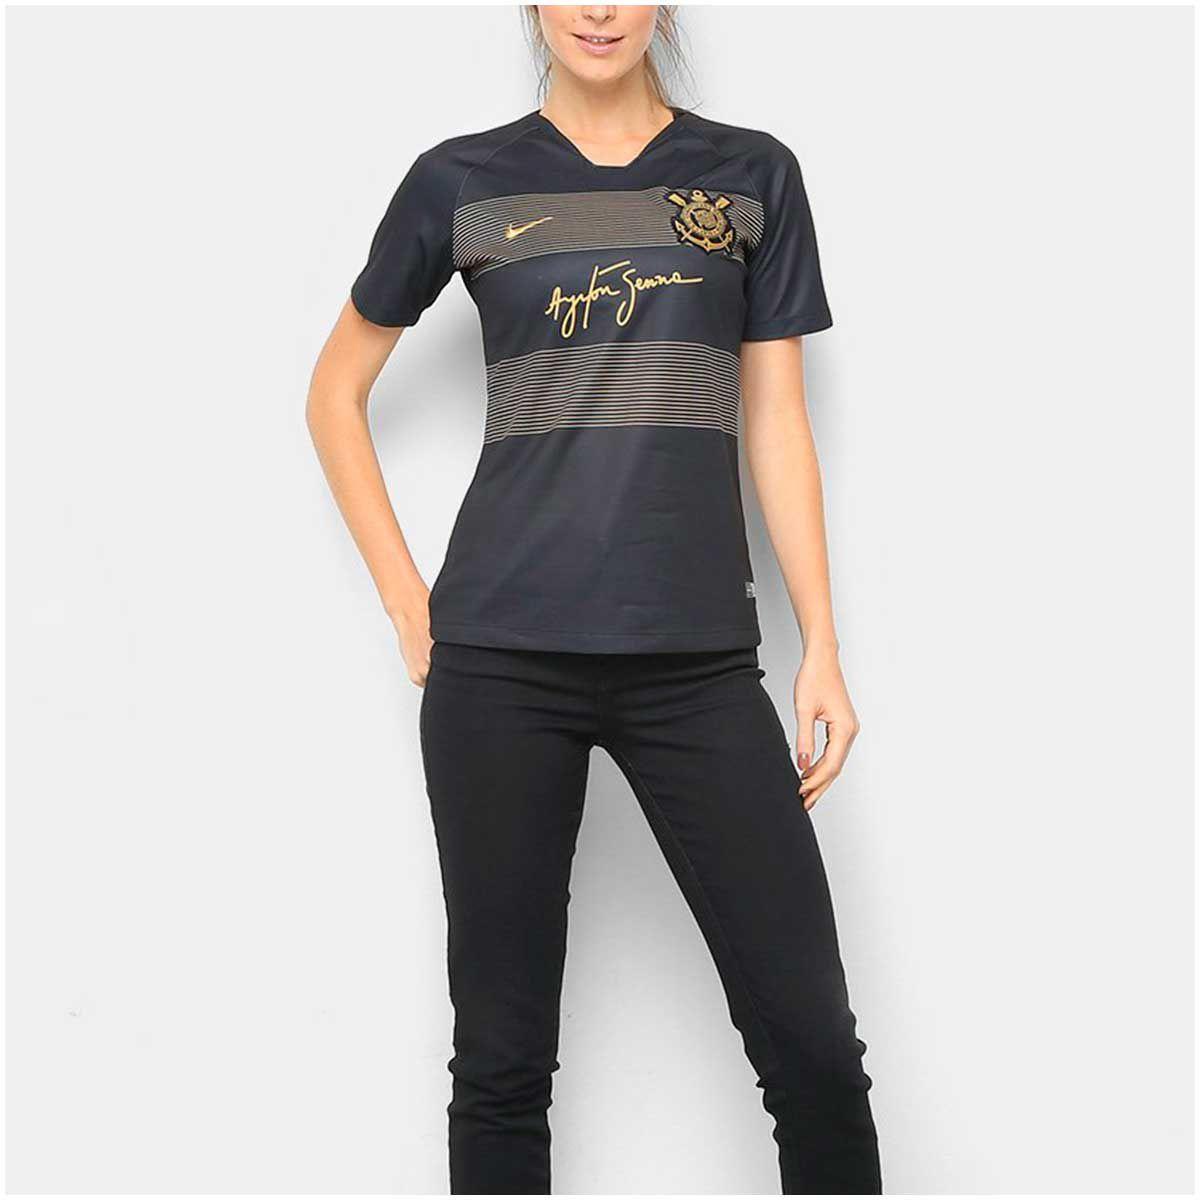 Camisa Corinthians III Nike Senna 2018/19 Feminina